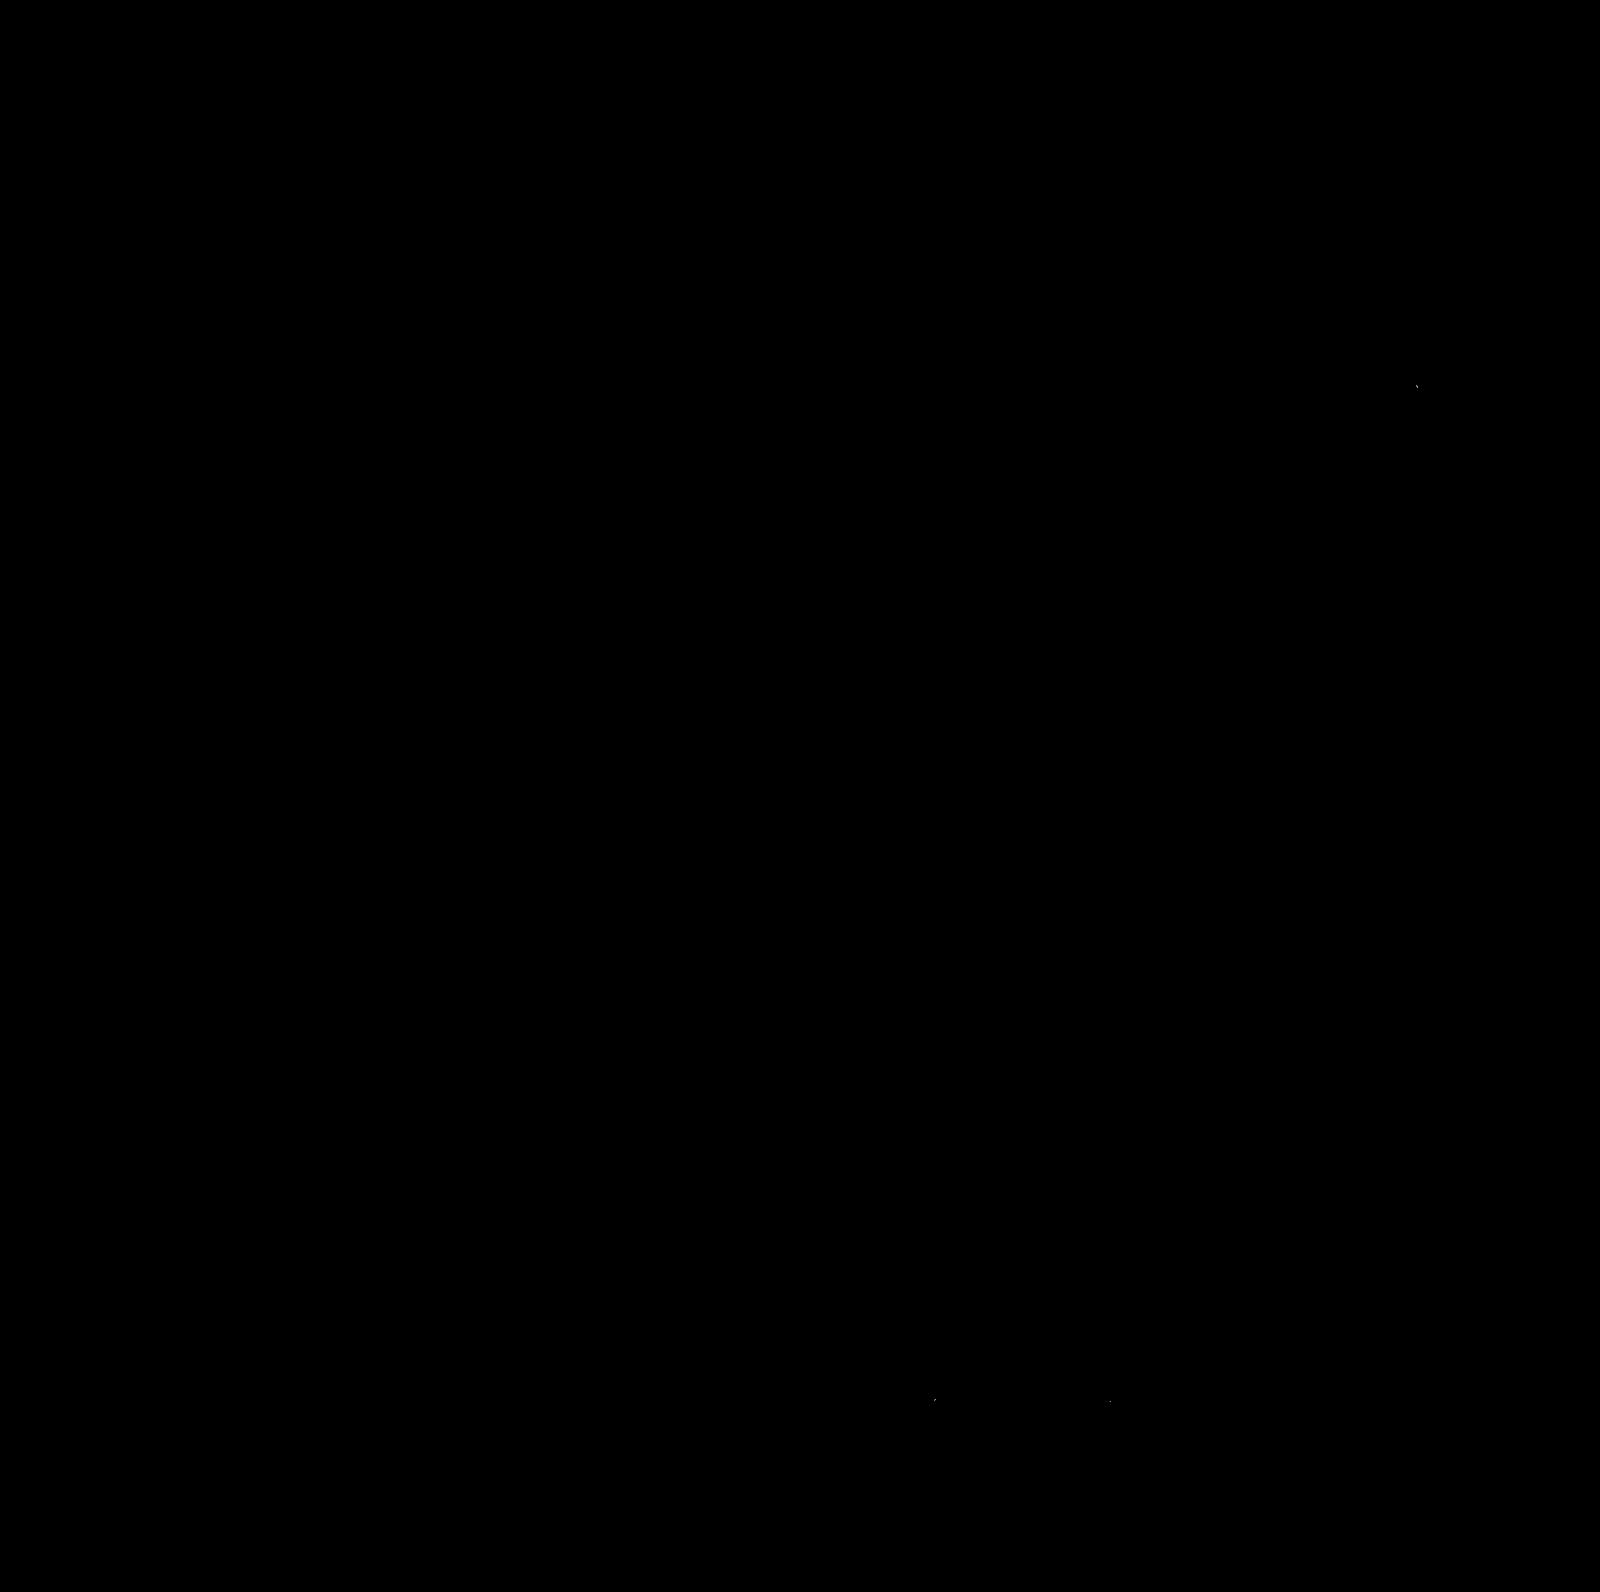 Gothic Vector